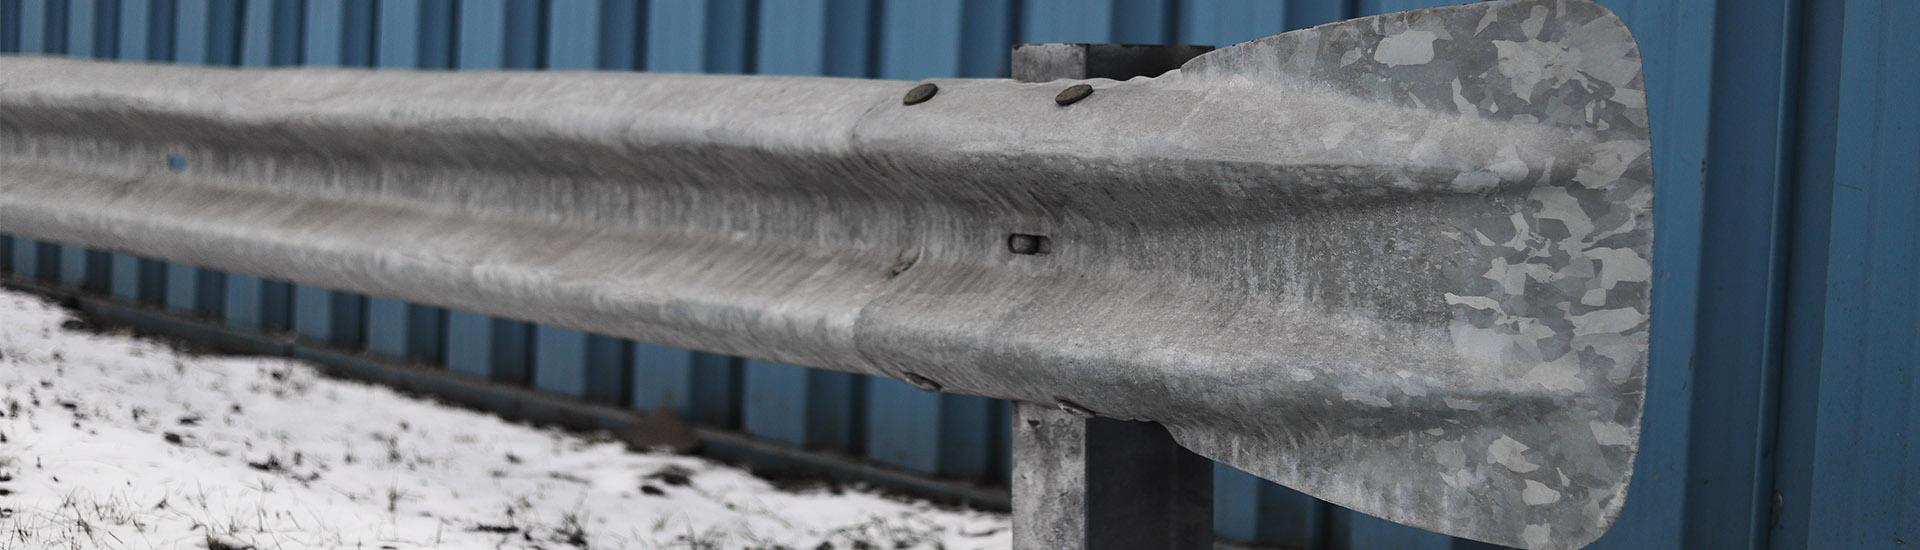 Highway Guardrail | Ideal ShieldIdeal Shield